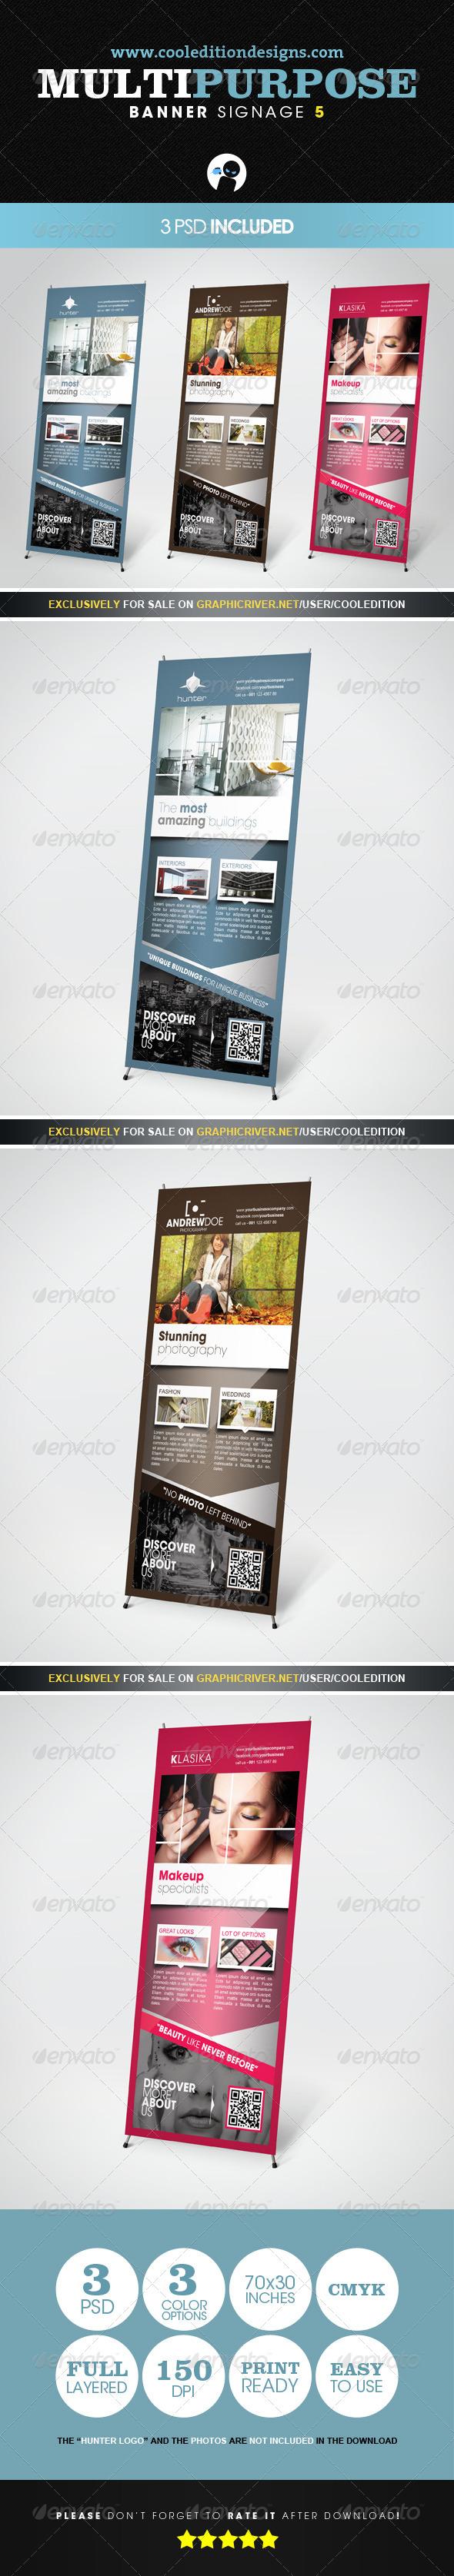 Multipurpose Banner Signage 5 - Signage Print Templates